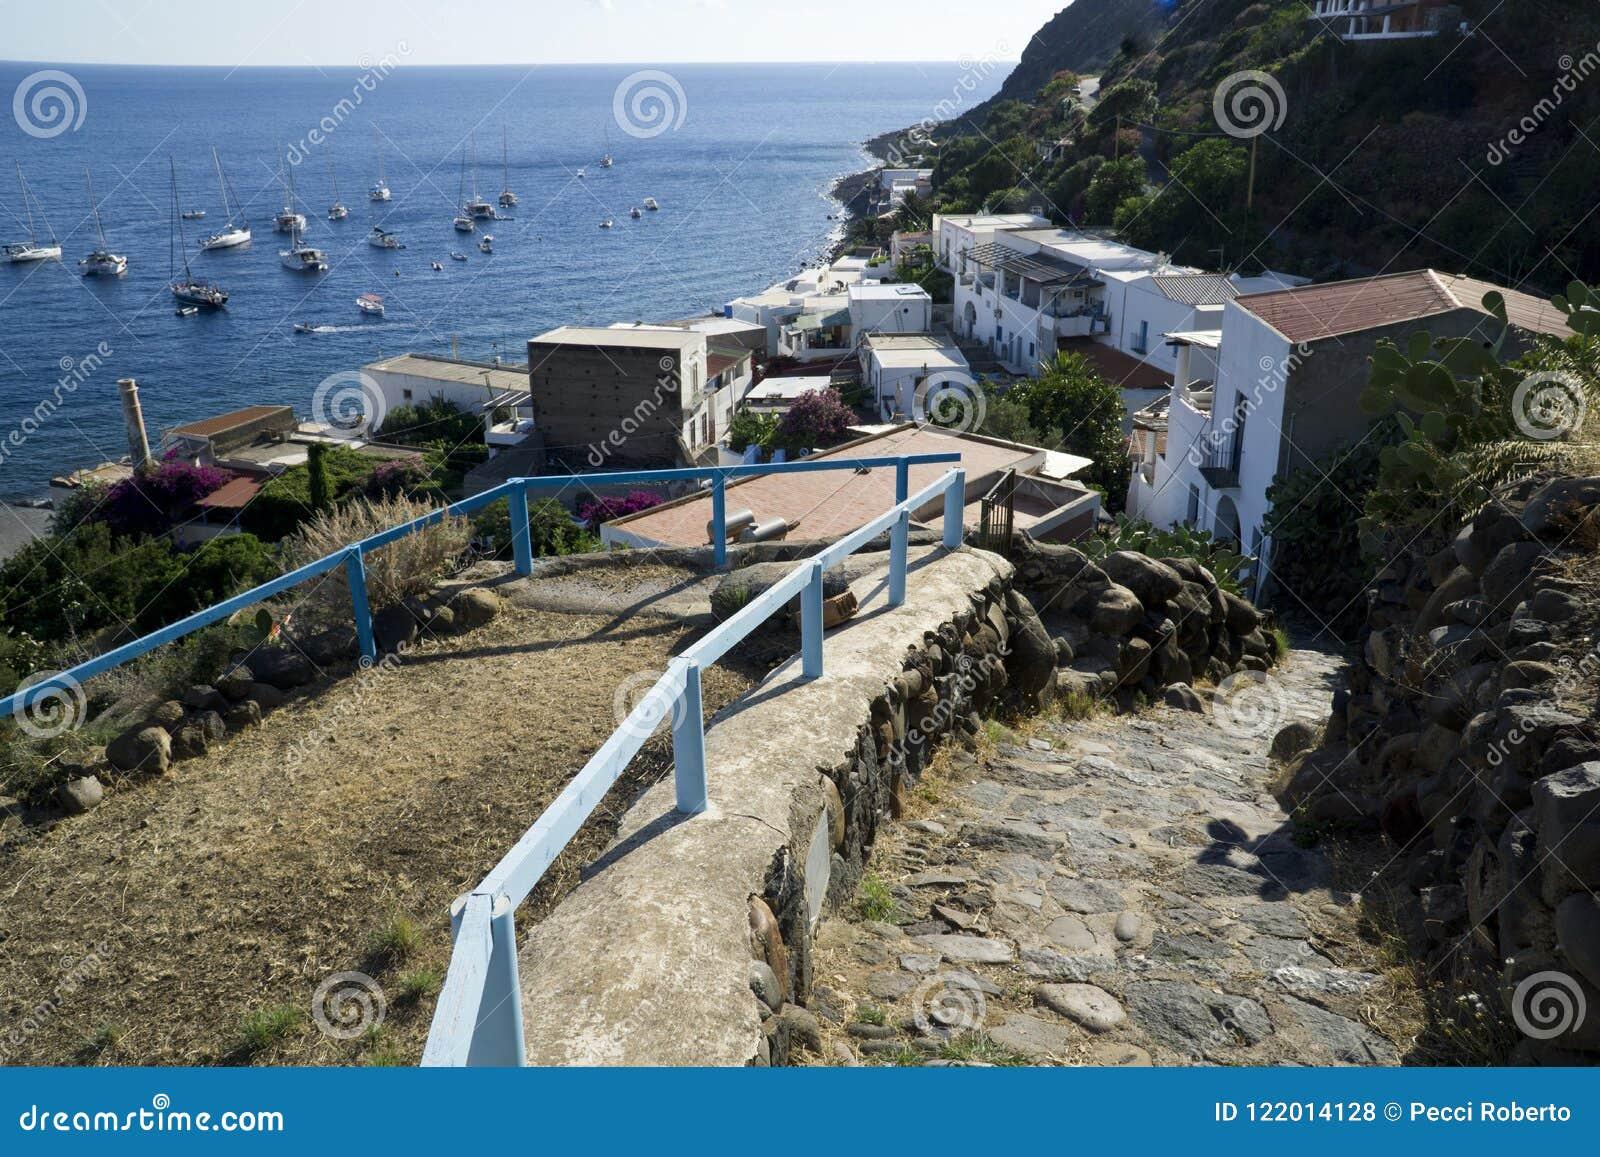 Äolische Inseln Italiens Sizilien, Alicudi-Insel